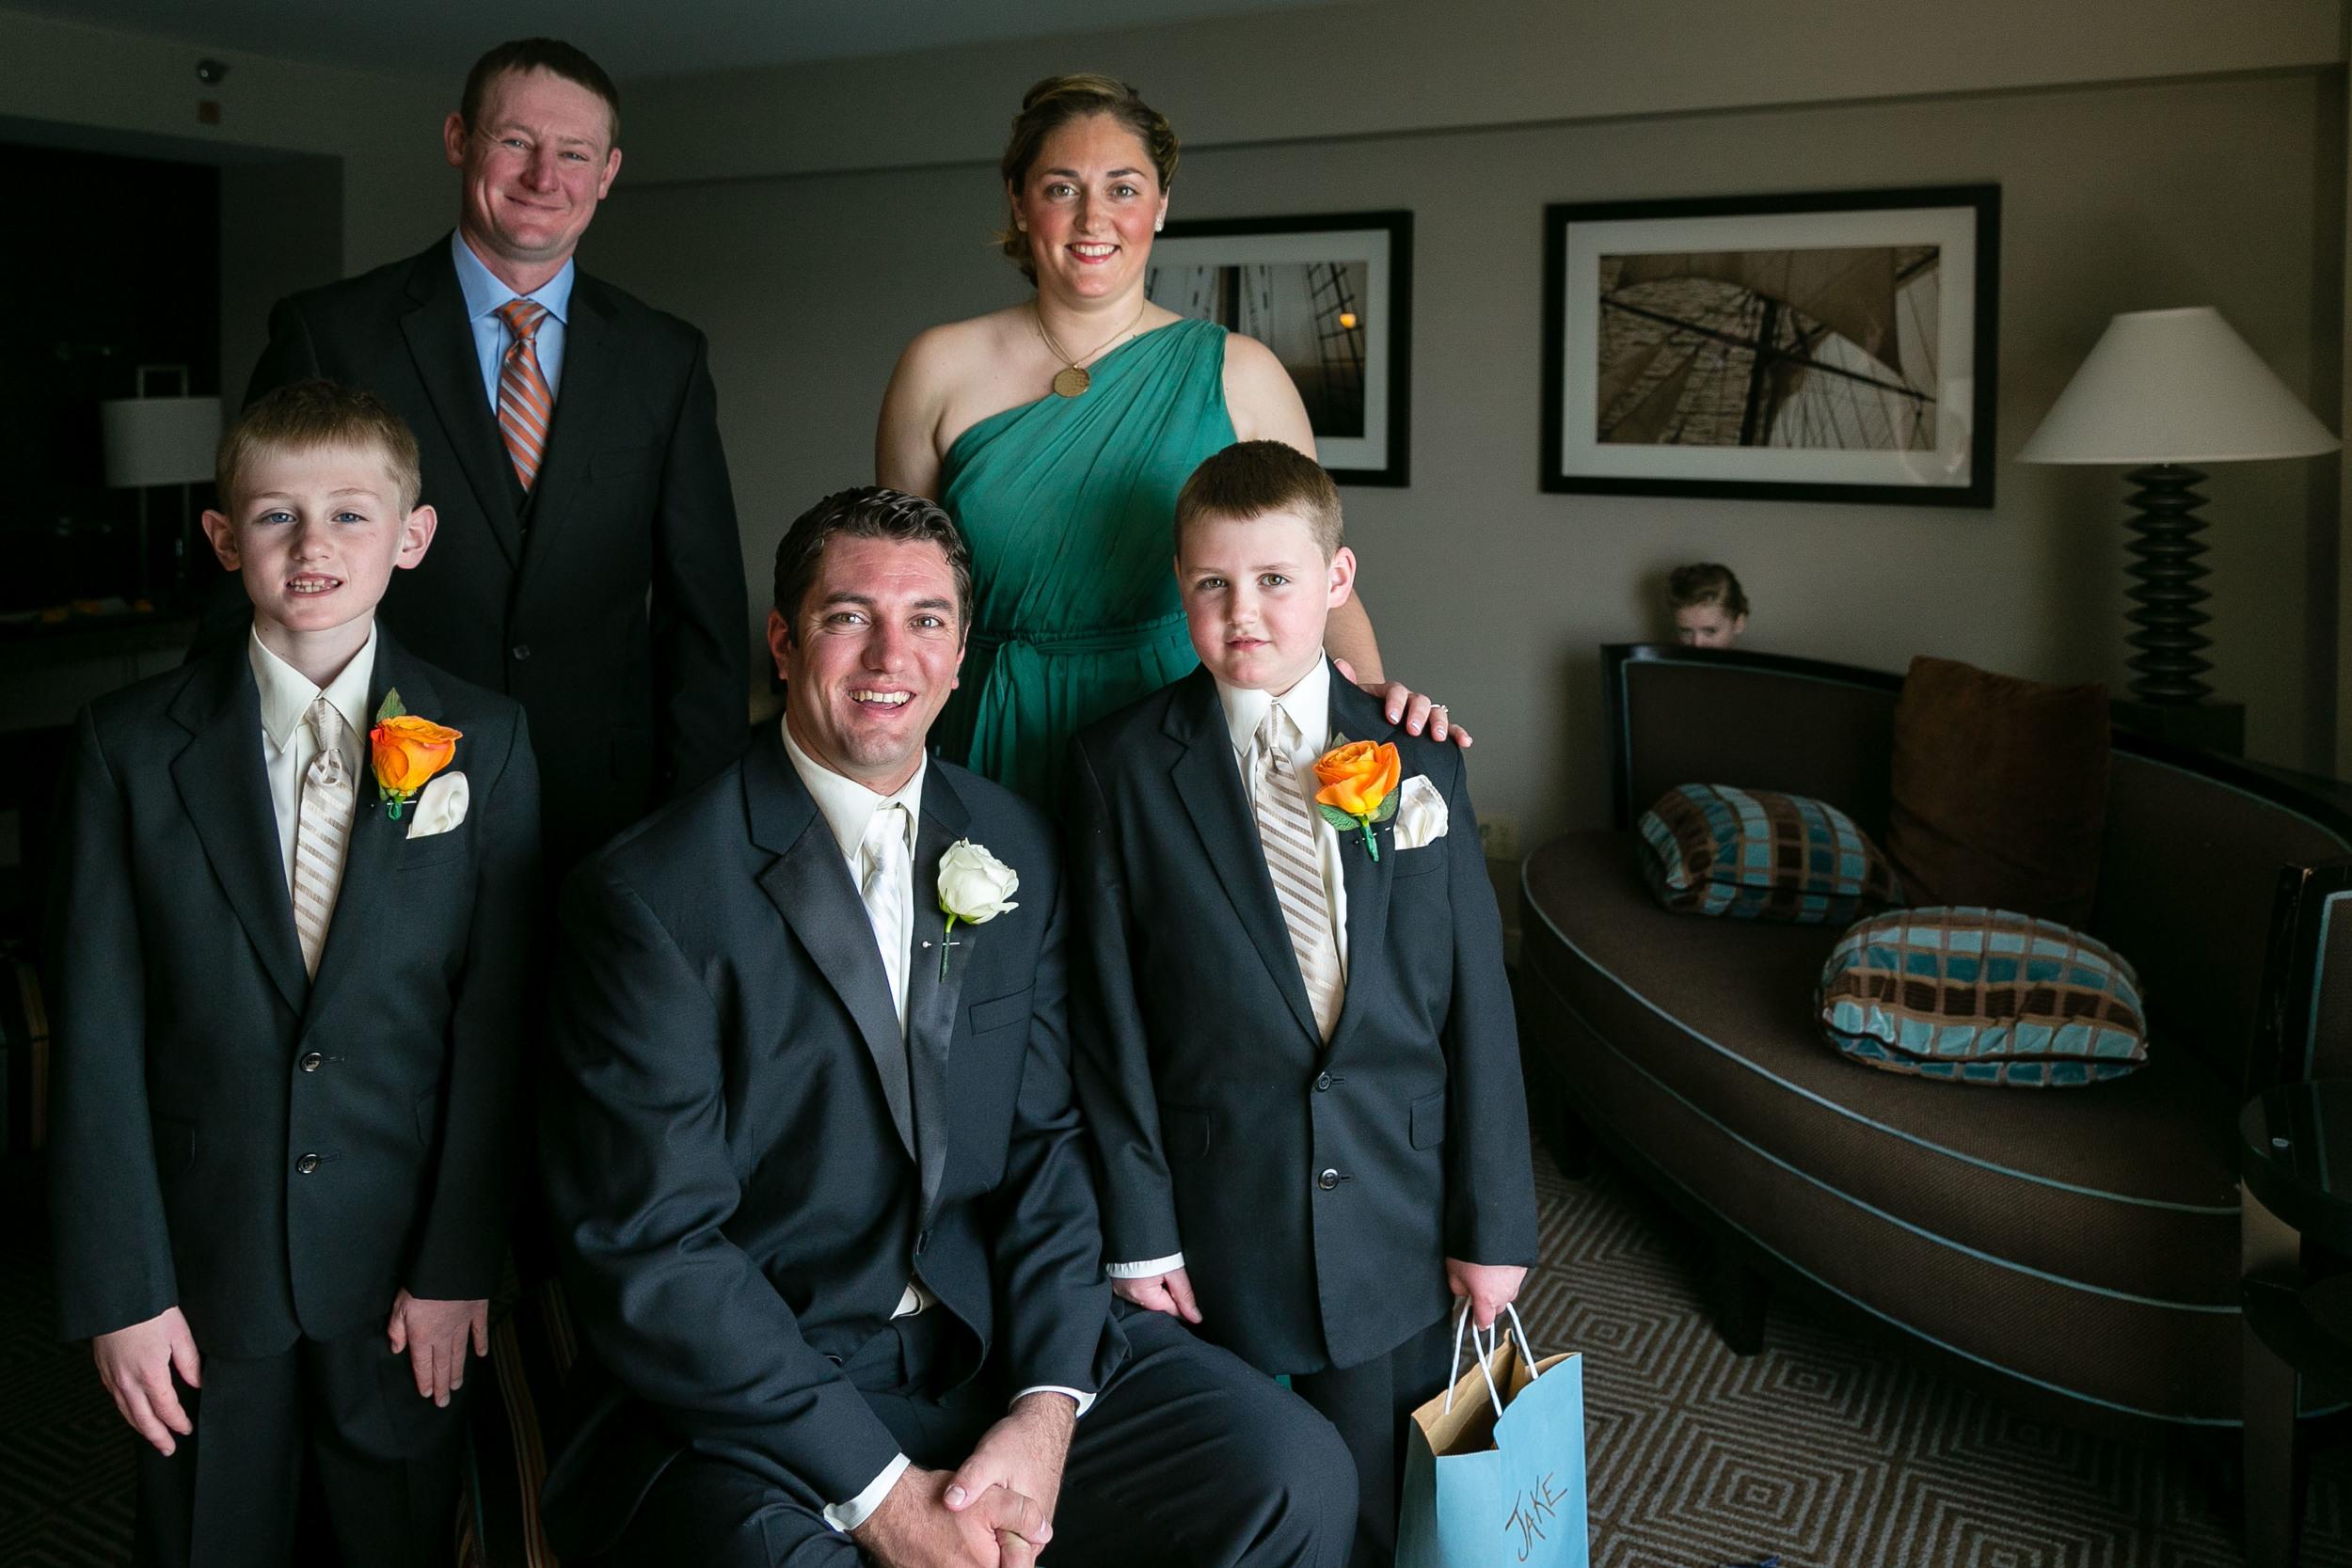 Romantic-Irish-Italian-Wedding-North-End-Boston-MA-Photojournalistic-Wedding-Photography-by-Jacek-Dolata-2.jpg